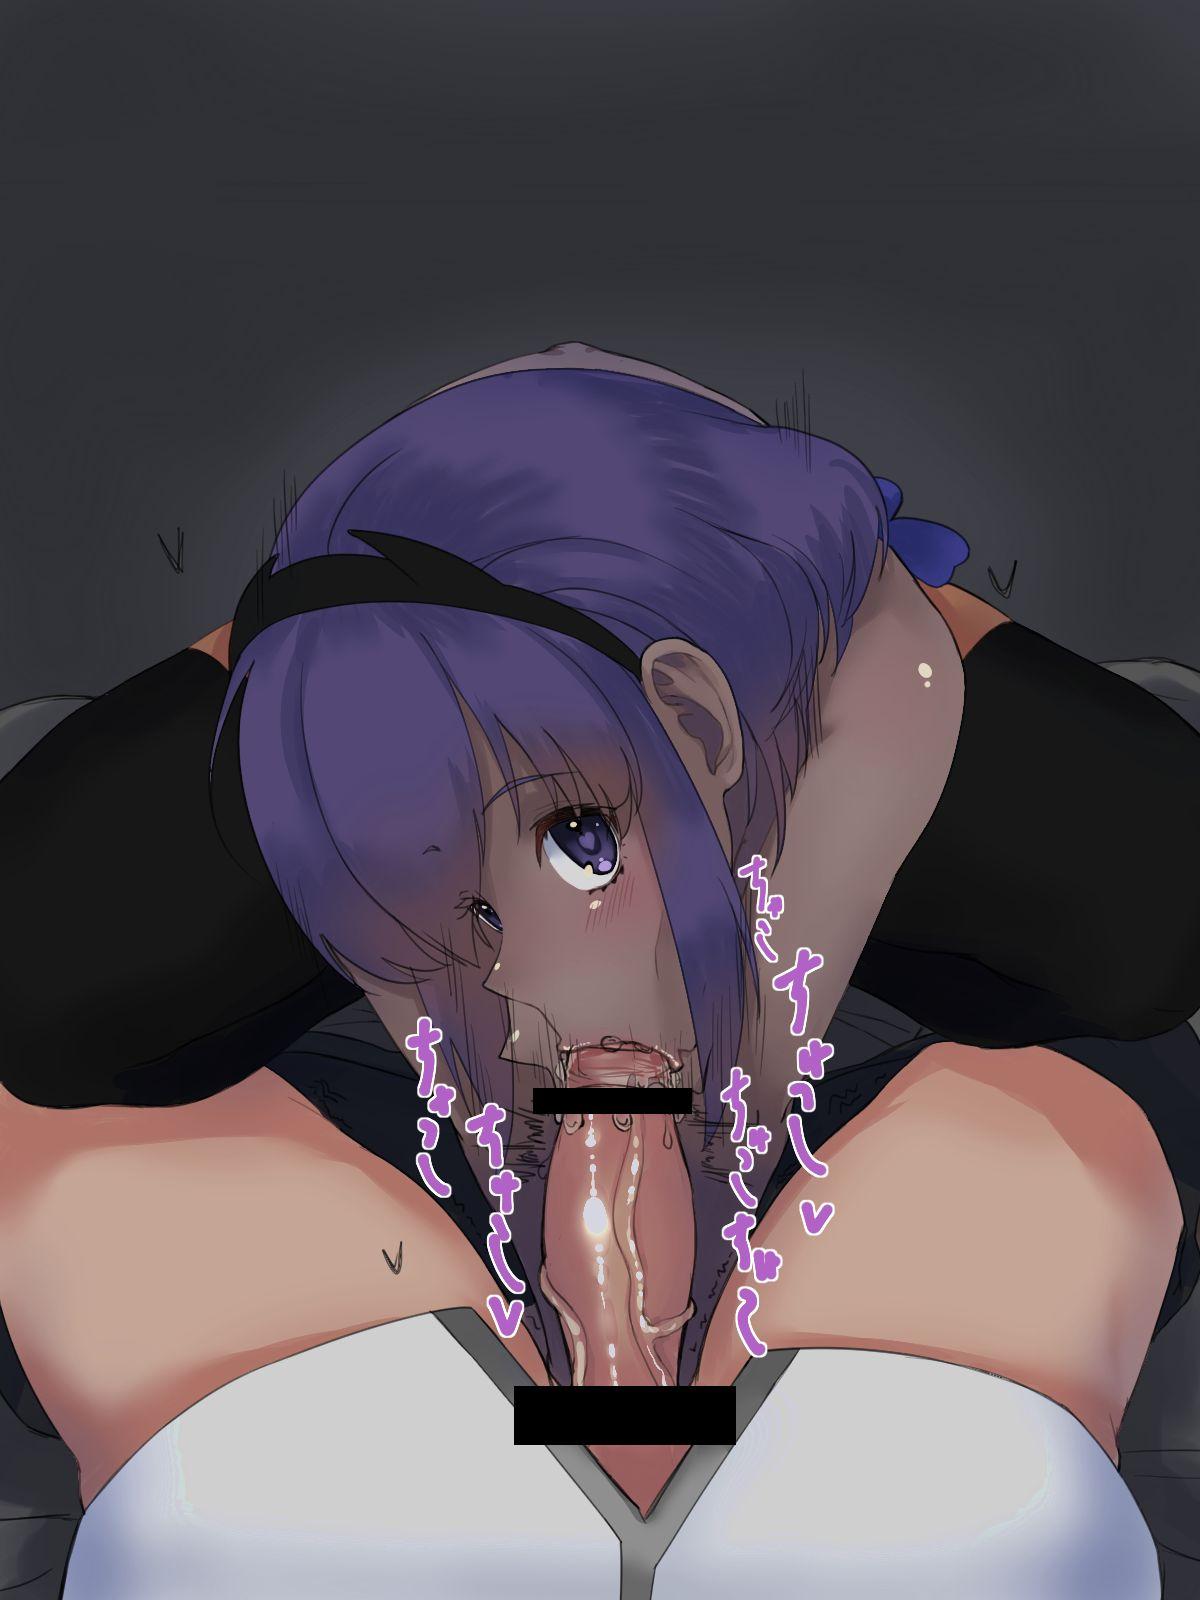 【FGO】静謐のハサンのひょっとこフェラ&お掃除フェラ二次エロ画像【Fate/GrandOrder】